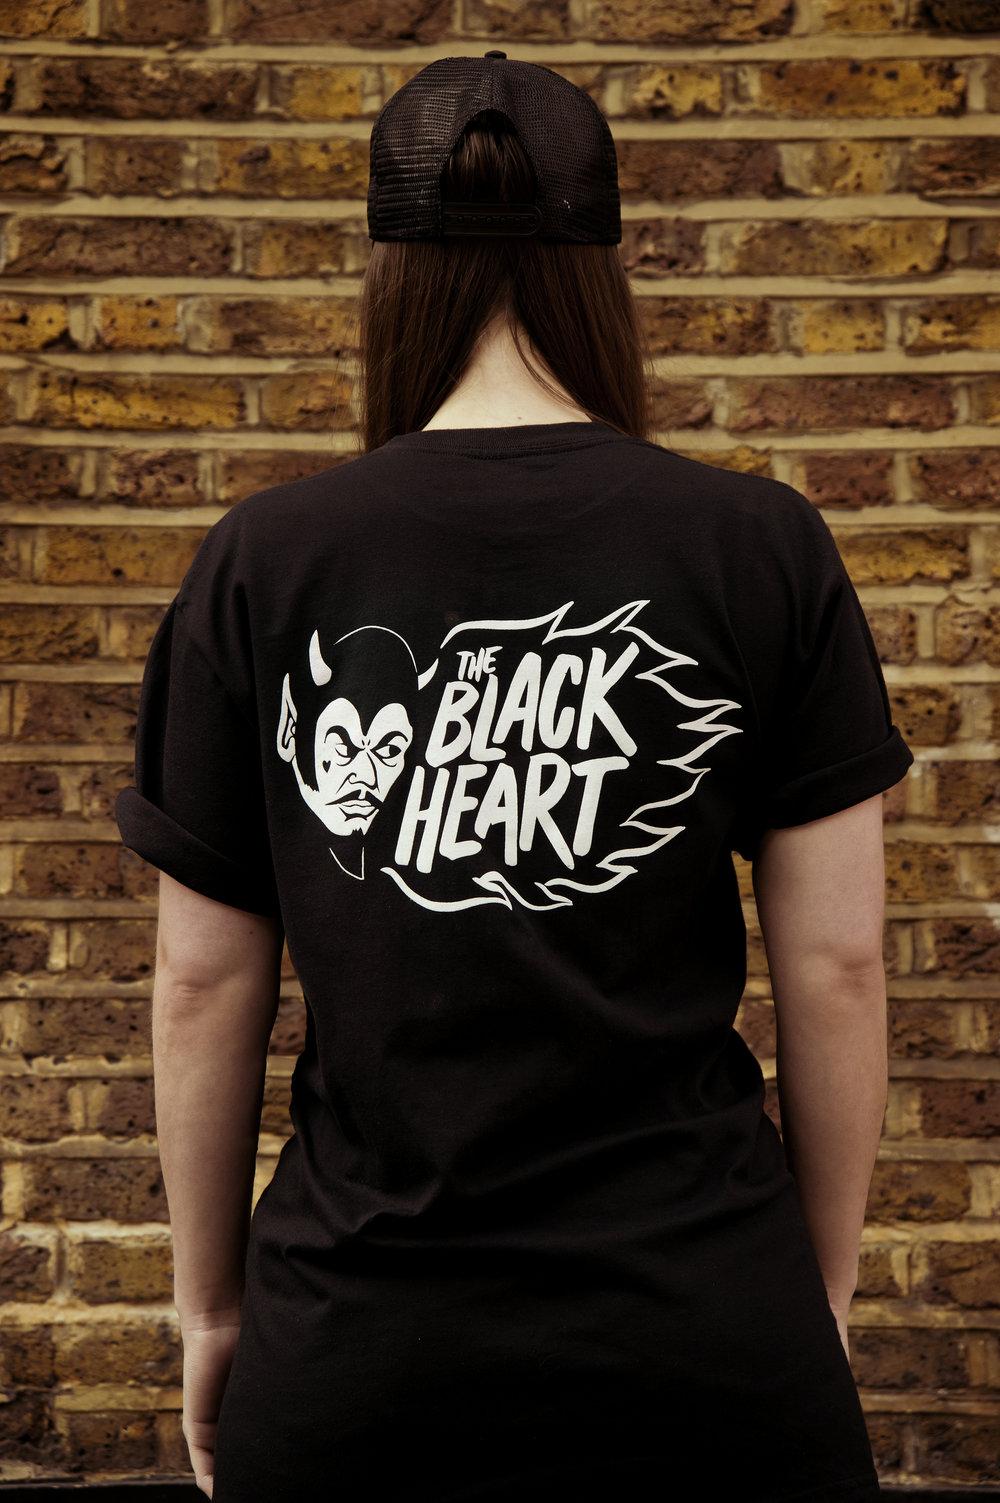 BlackHeart-EsterSegarra-4522.jpg